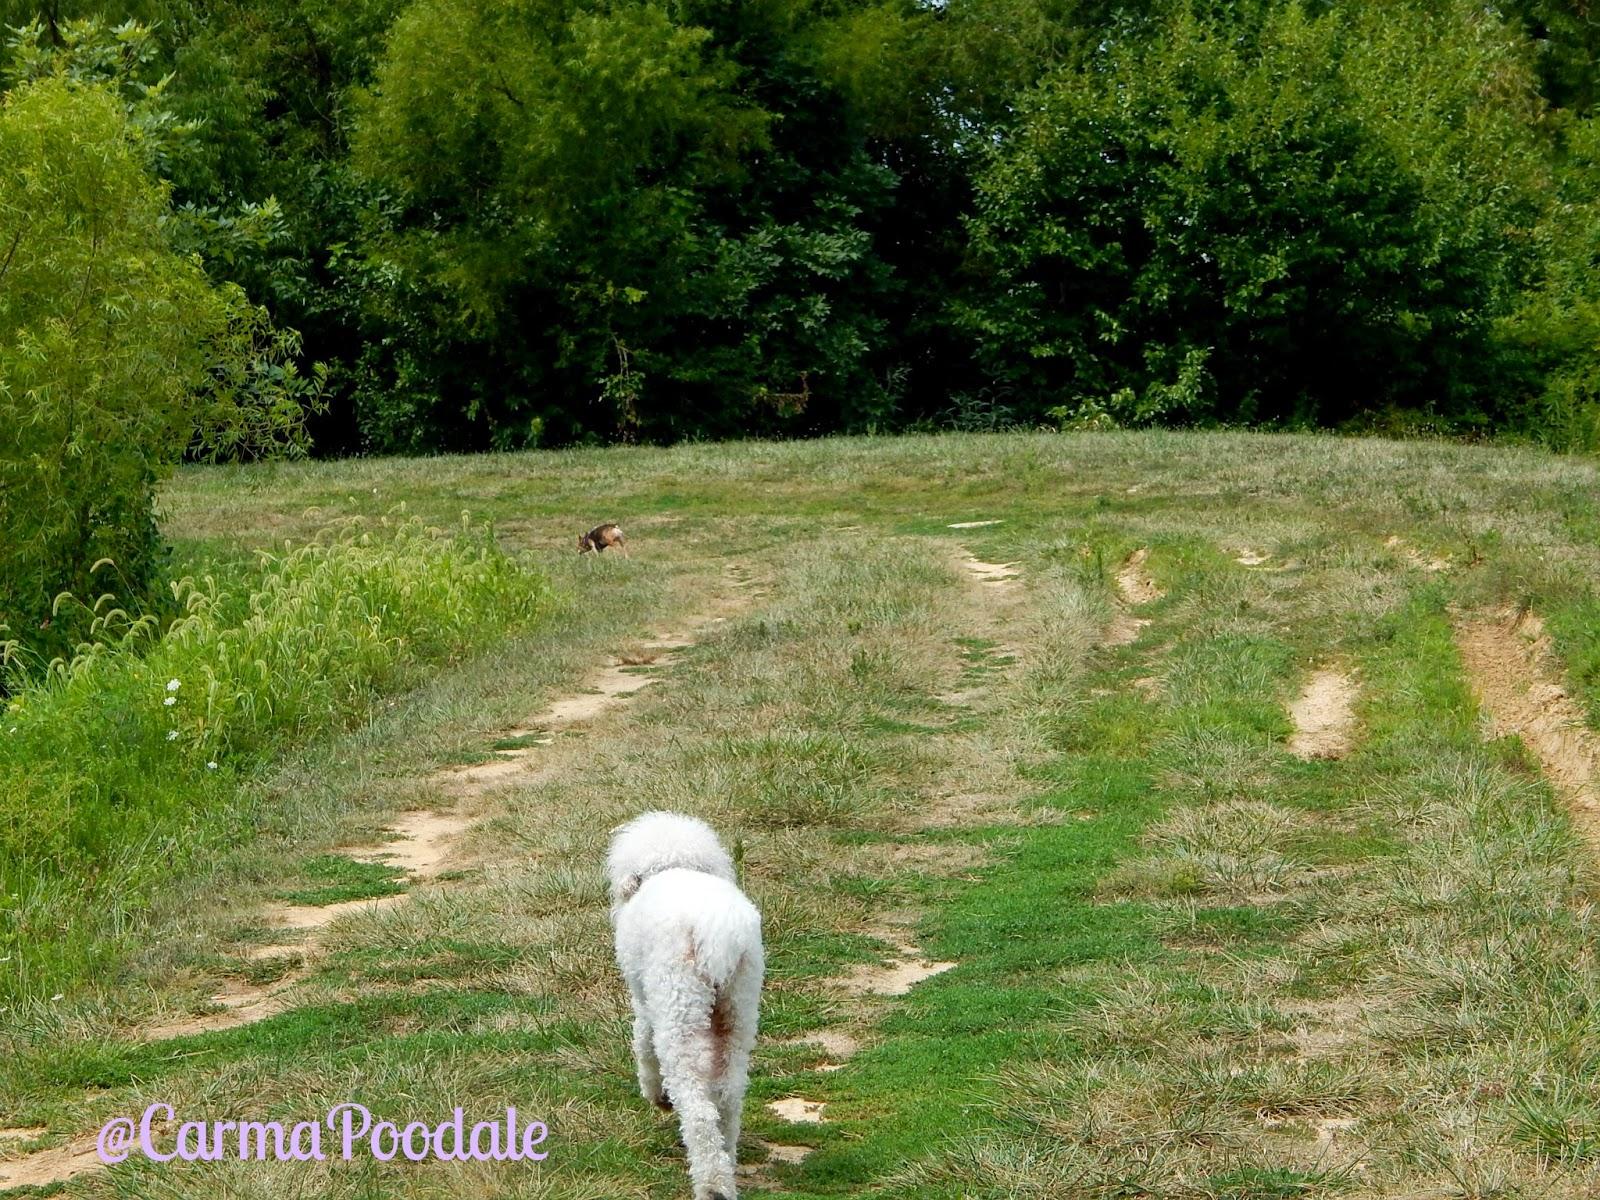 Carma walking down trail